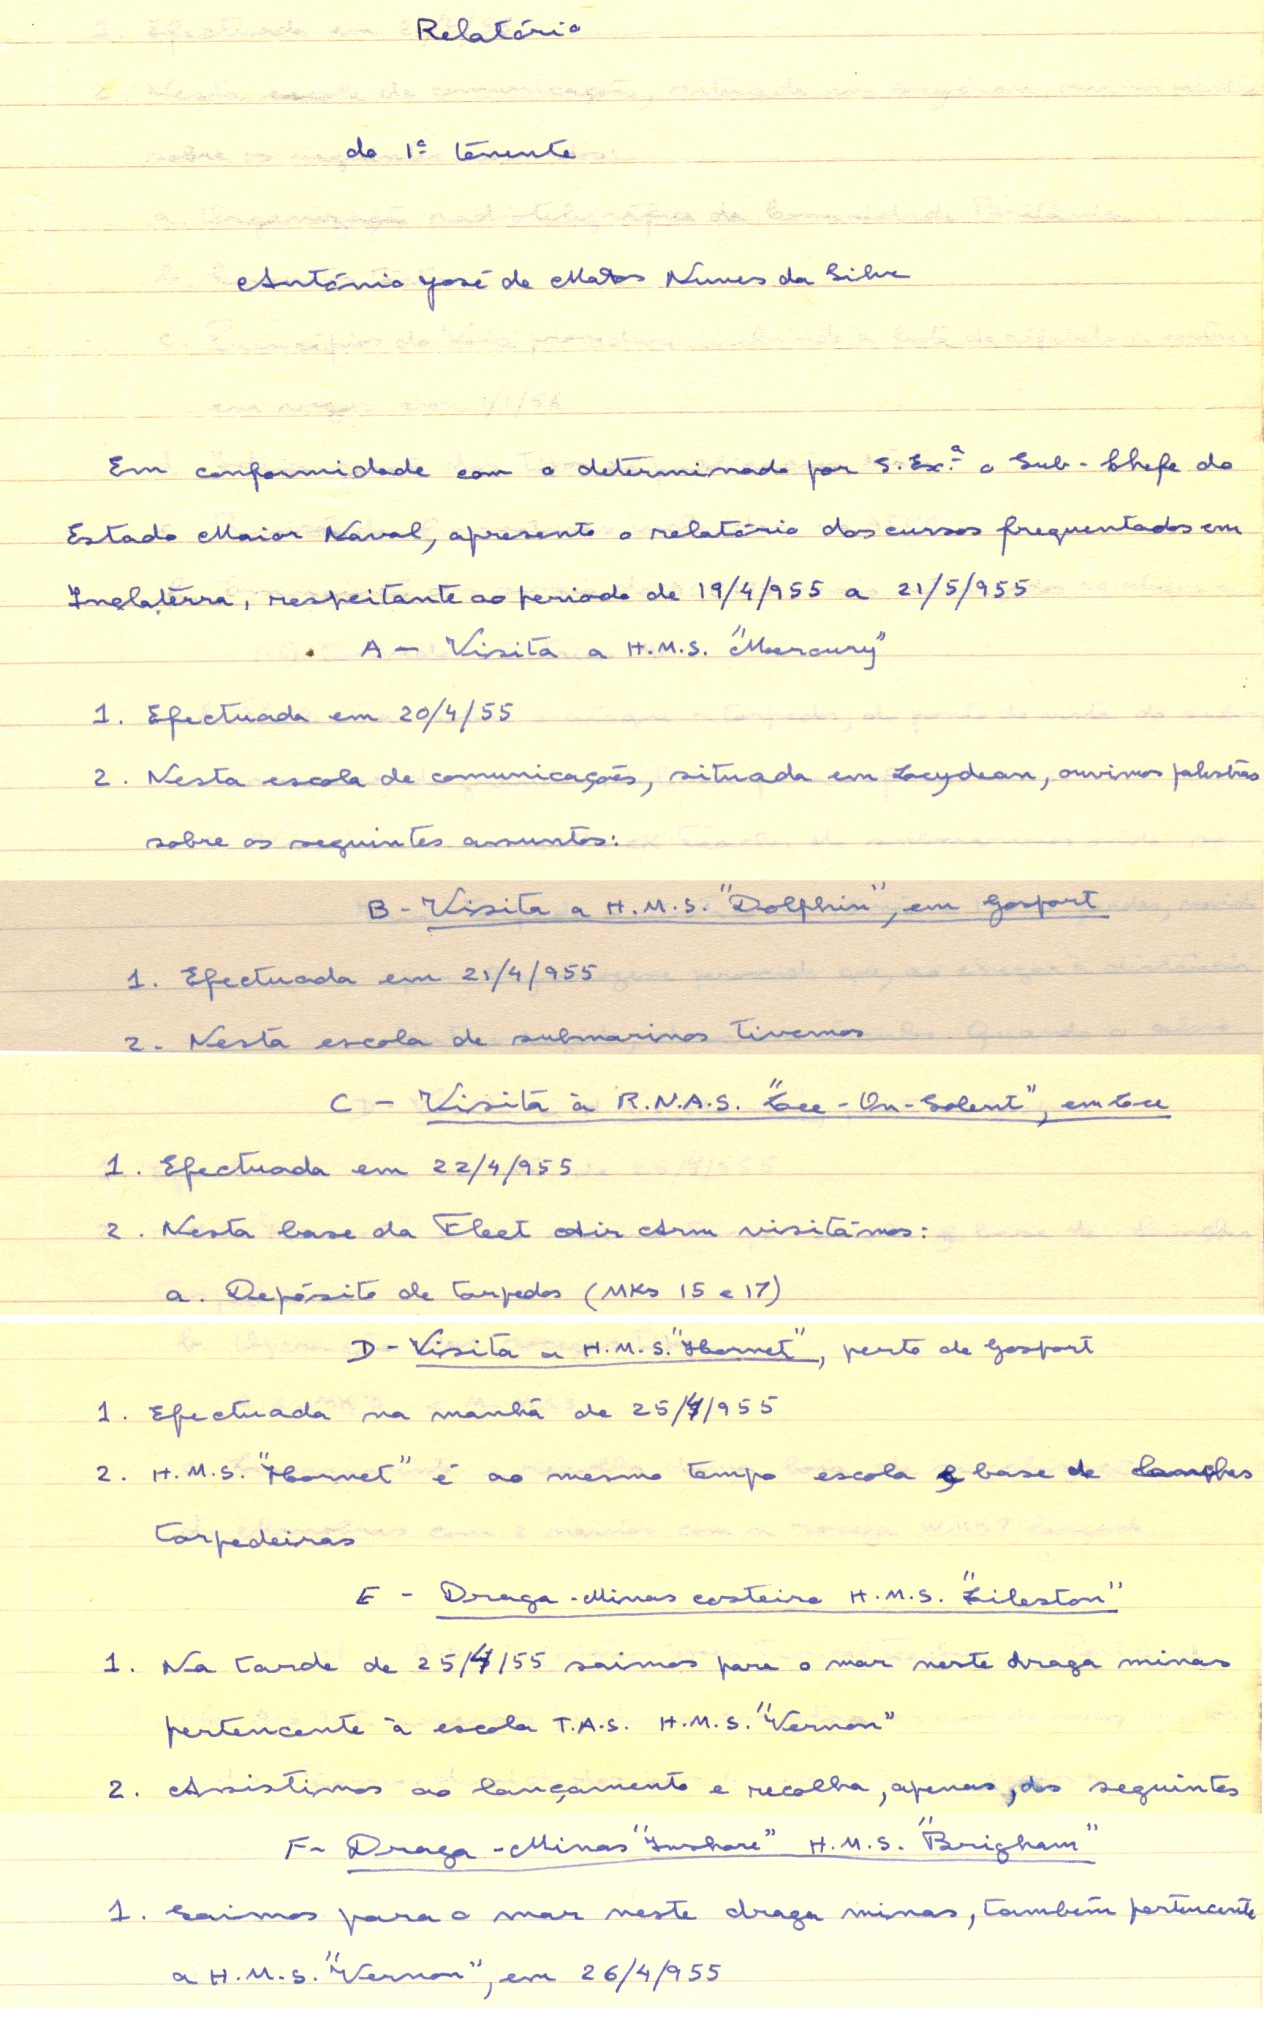 00286 955-05-21 extractos de relatório sobre diversos estágios pós exames curso TAS - 1 de 2